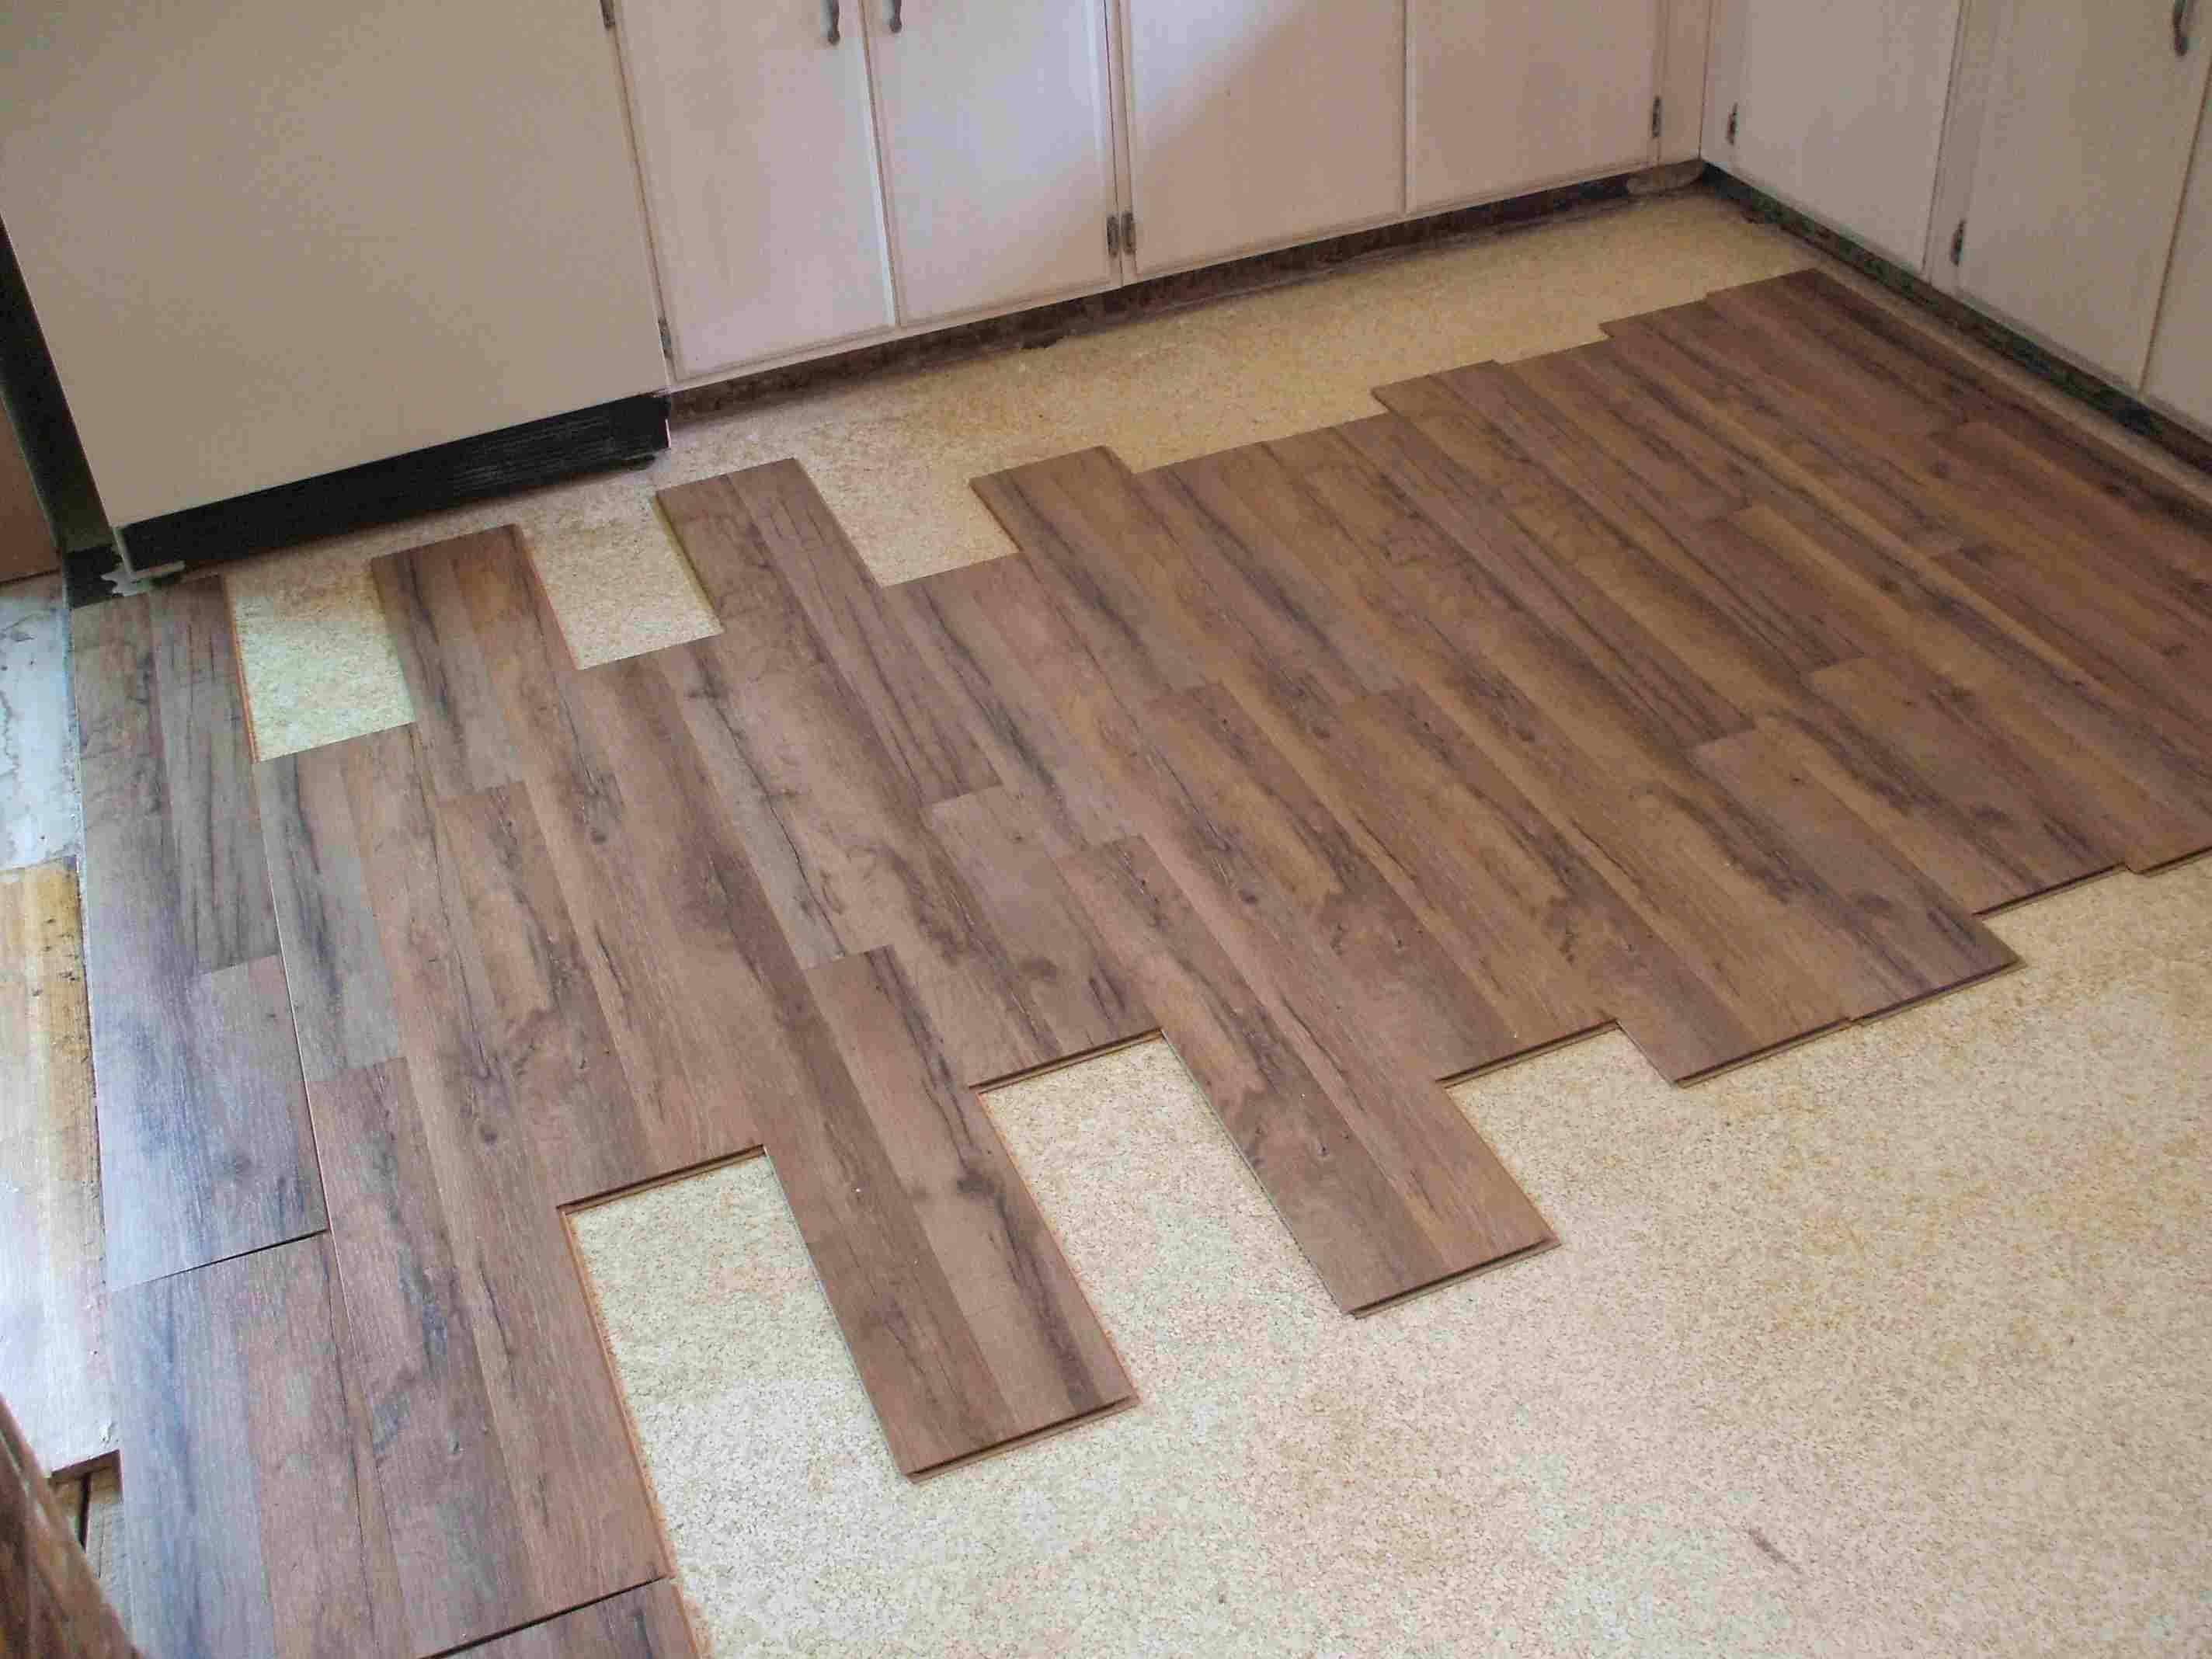 Price To Install Hardwood Floors Per Square Foot Wood House Interieur Architect Living Instagood In 2020 Installing Laminate Flooring Laminate Flooring Diy Vinyl Plank Flooring